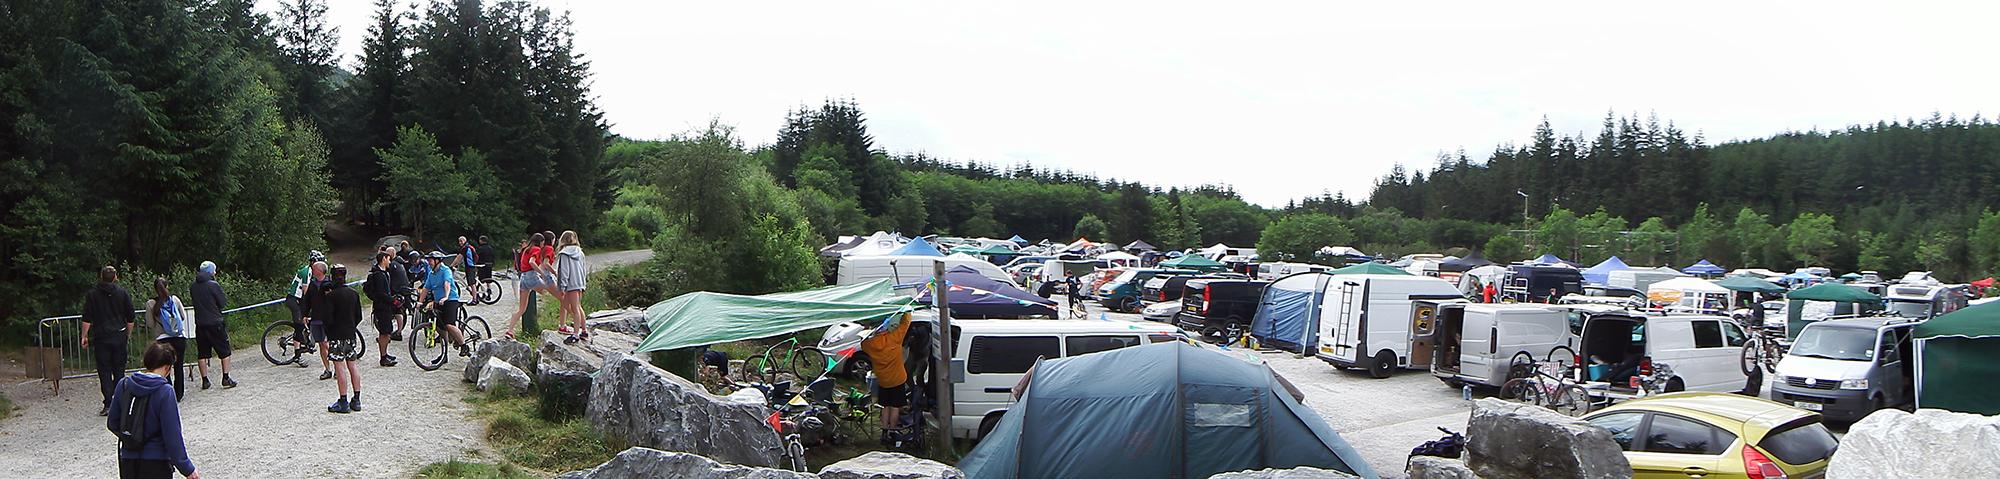 10 under the ben campsite